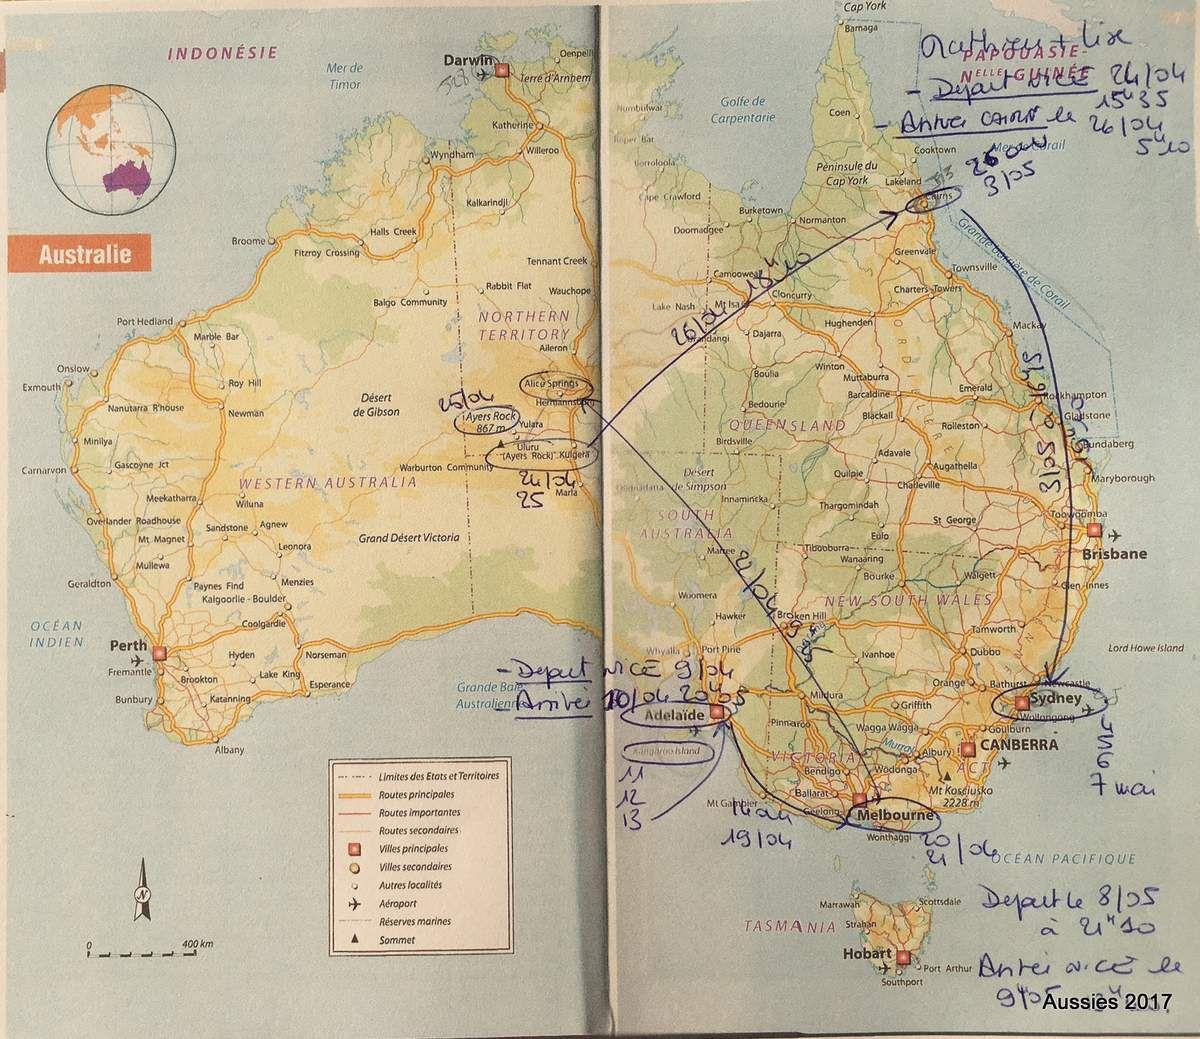 Notre trip in Australia